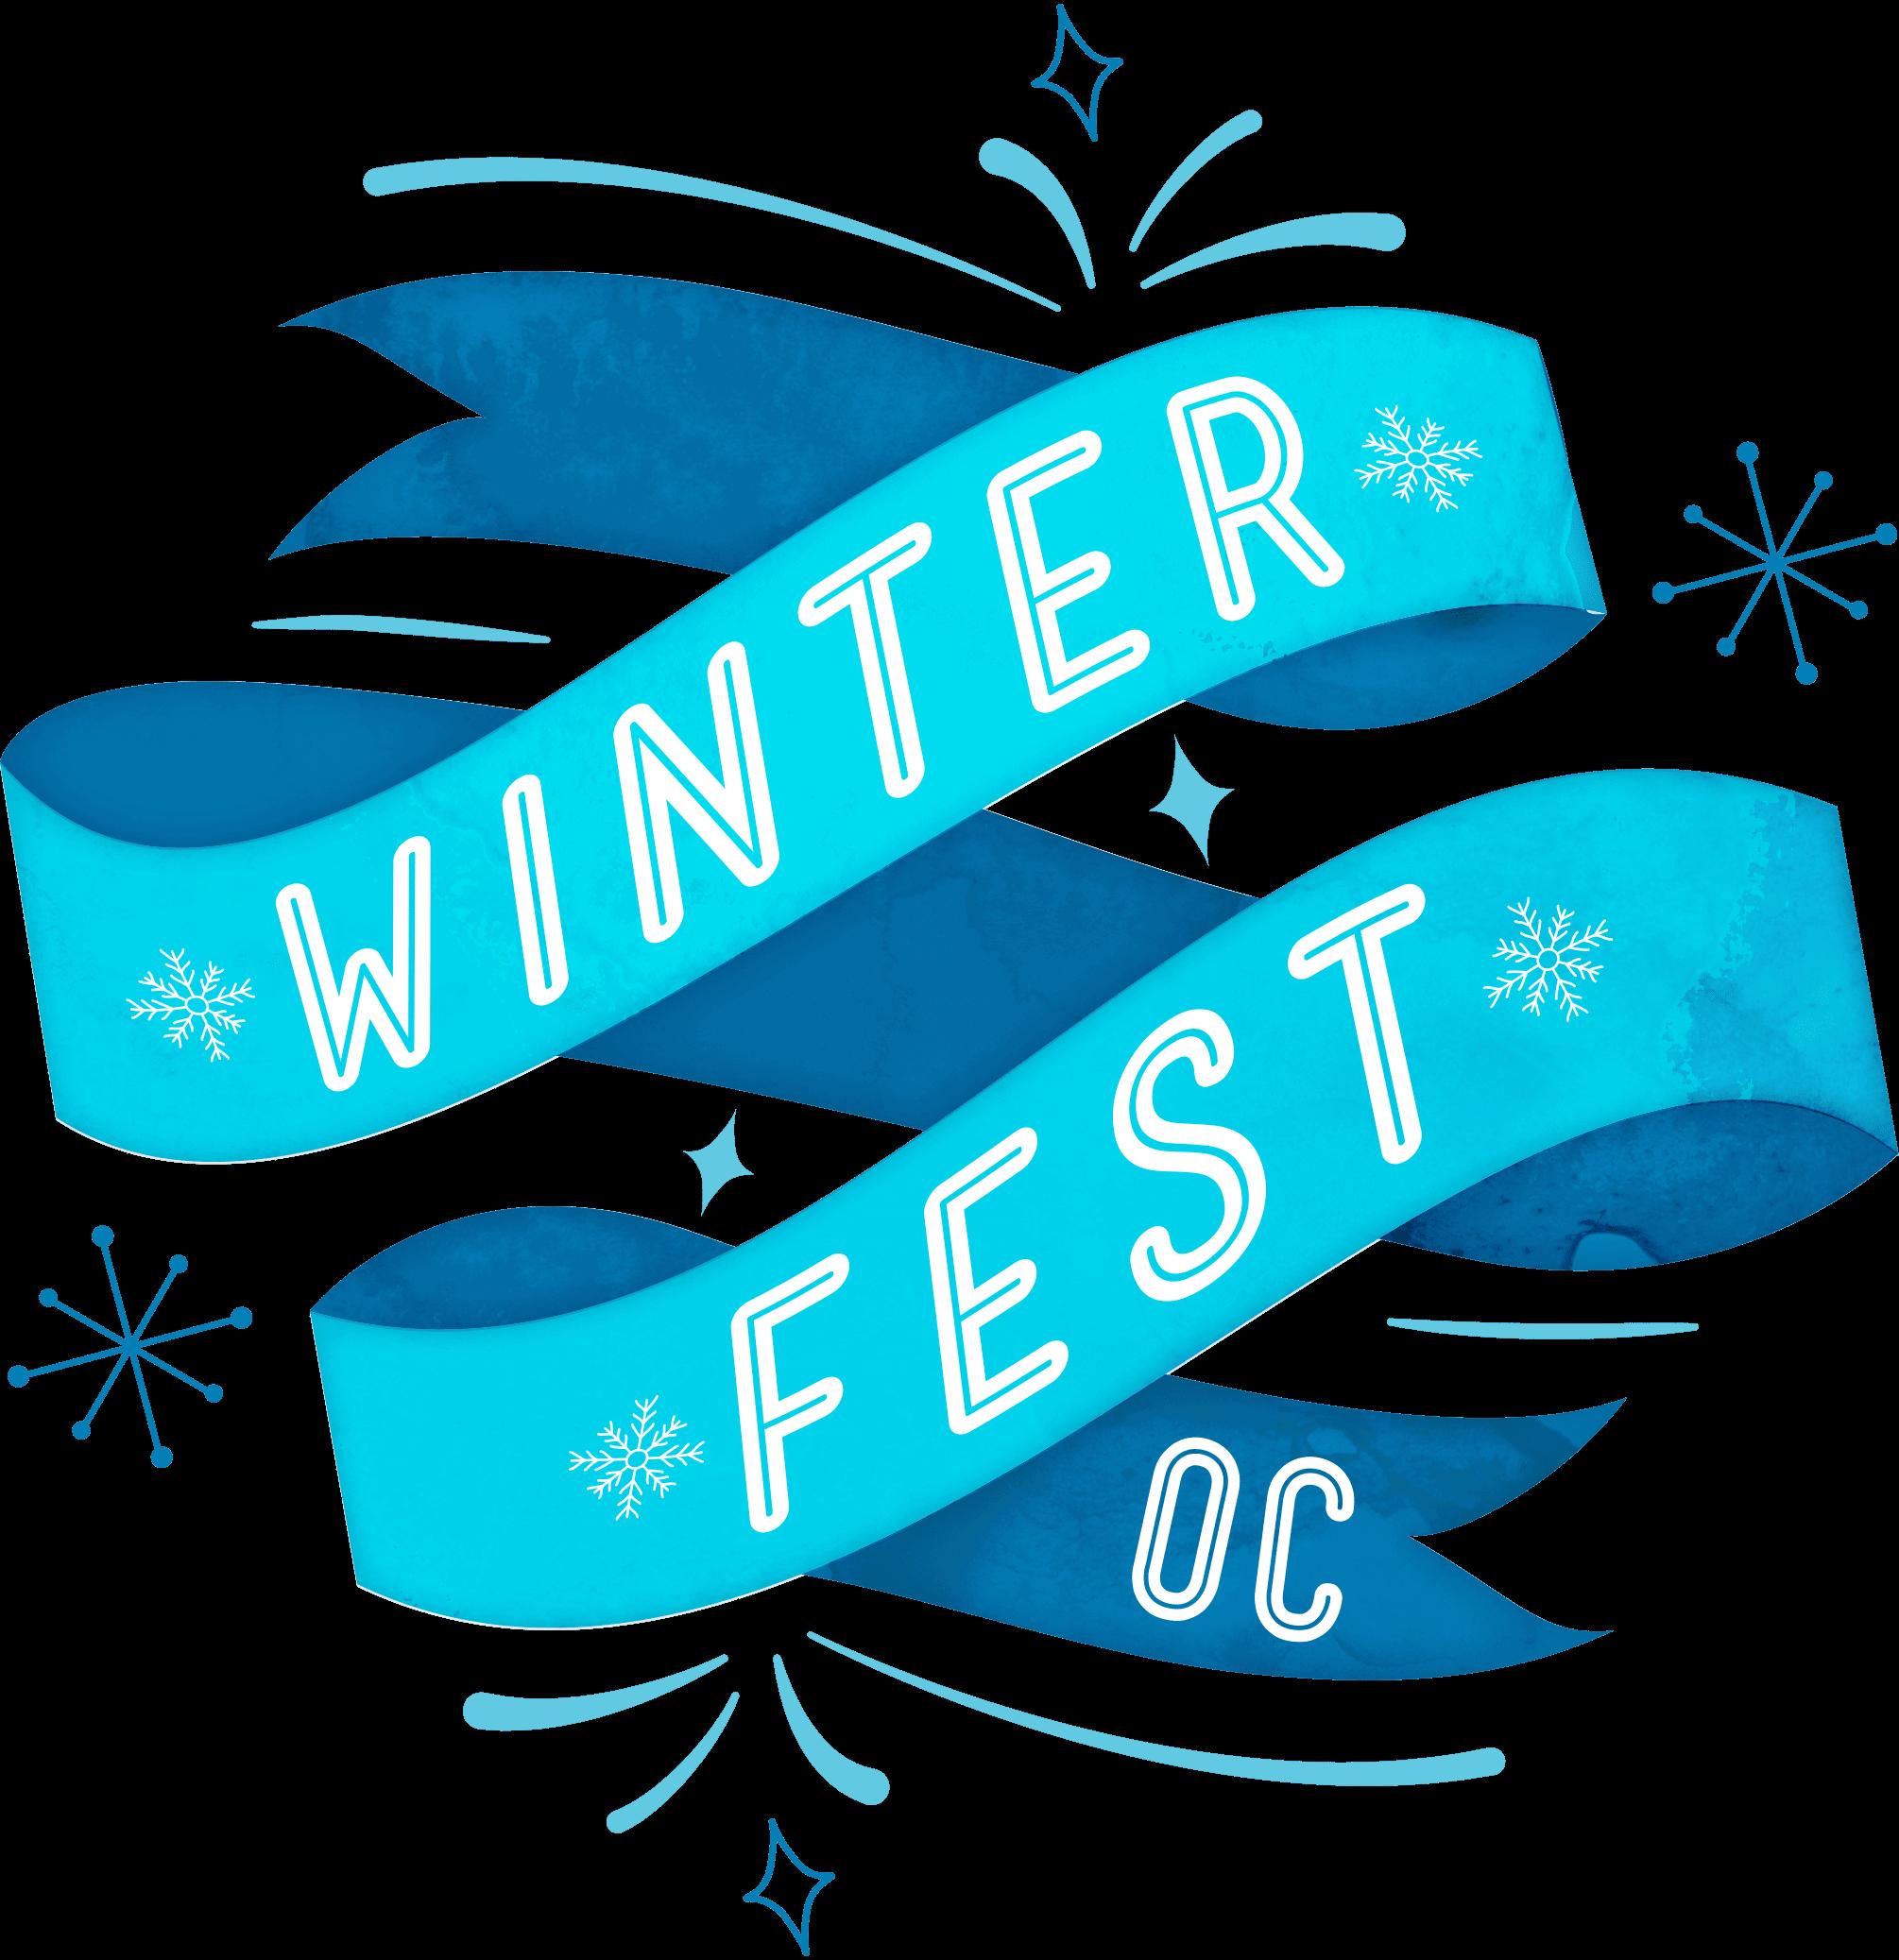 Winterfest clipart transparent banner download Schedule   Winter Fest OC 2019 banner download